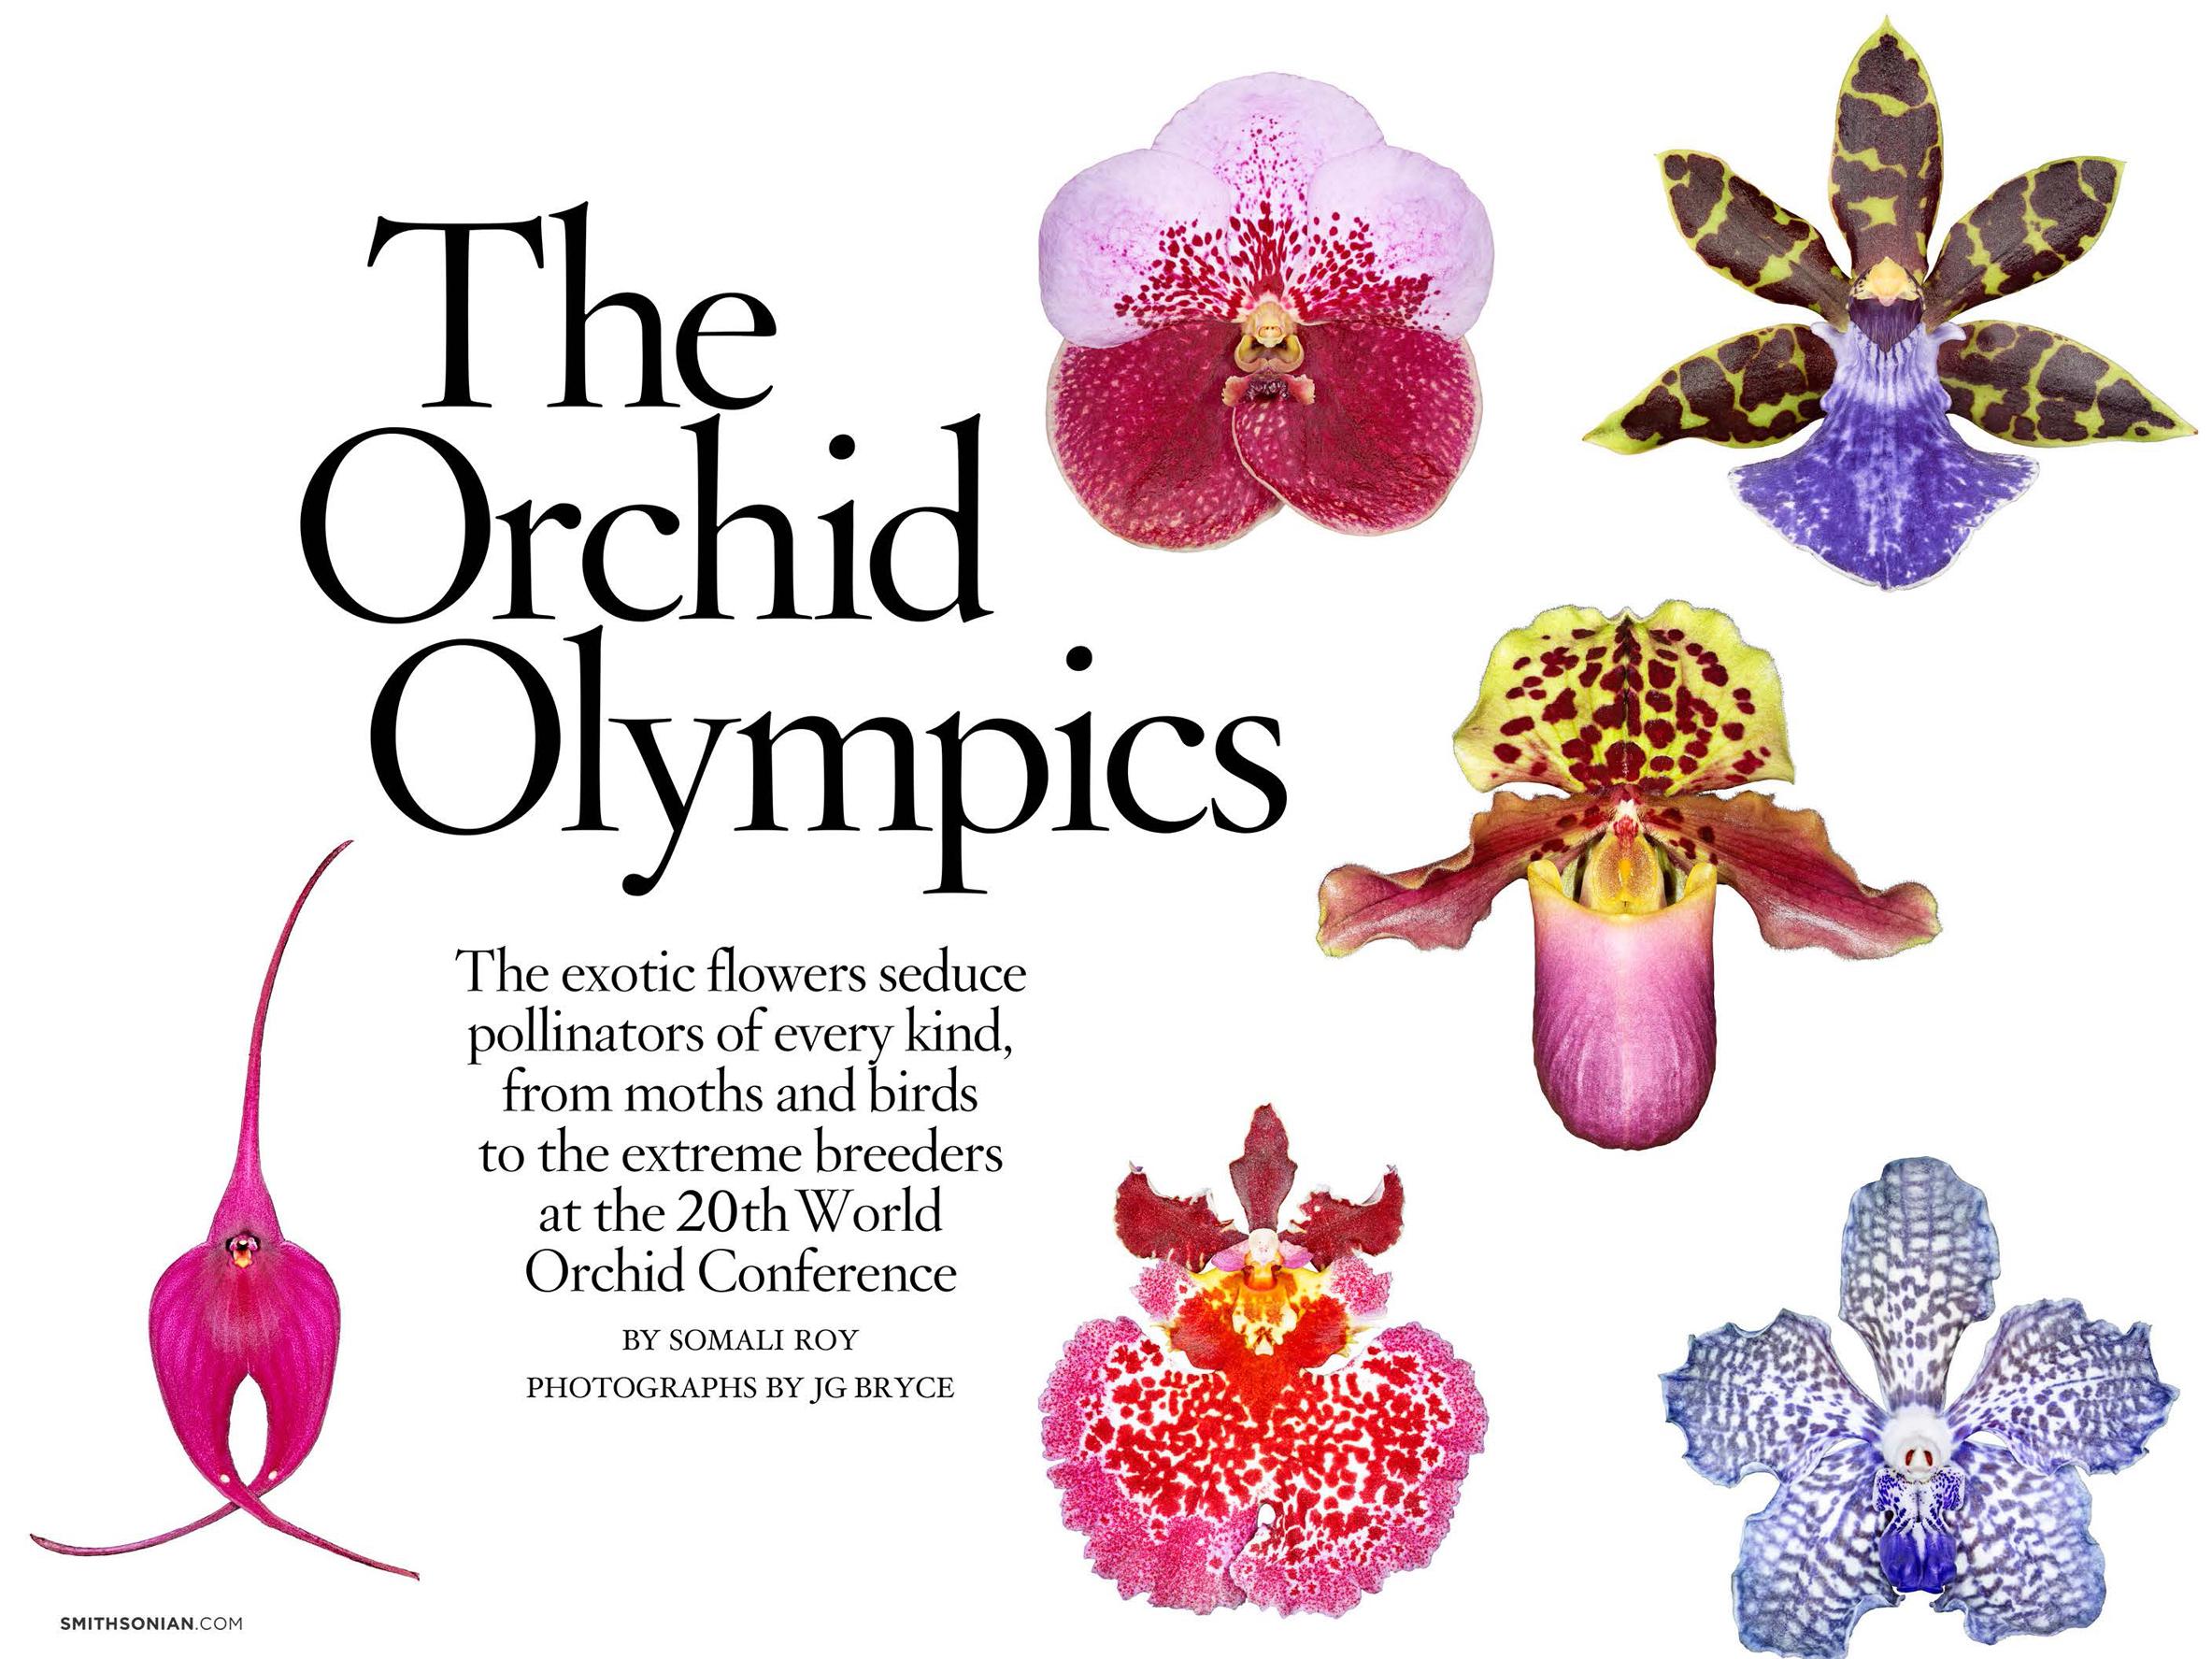 OrchidOlympics_Page_01 copy.jpg